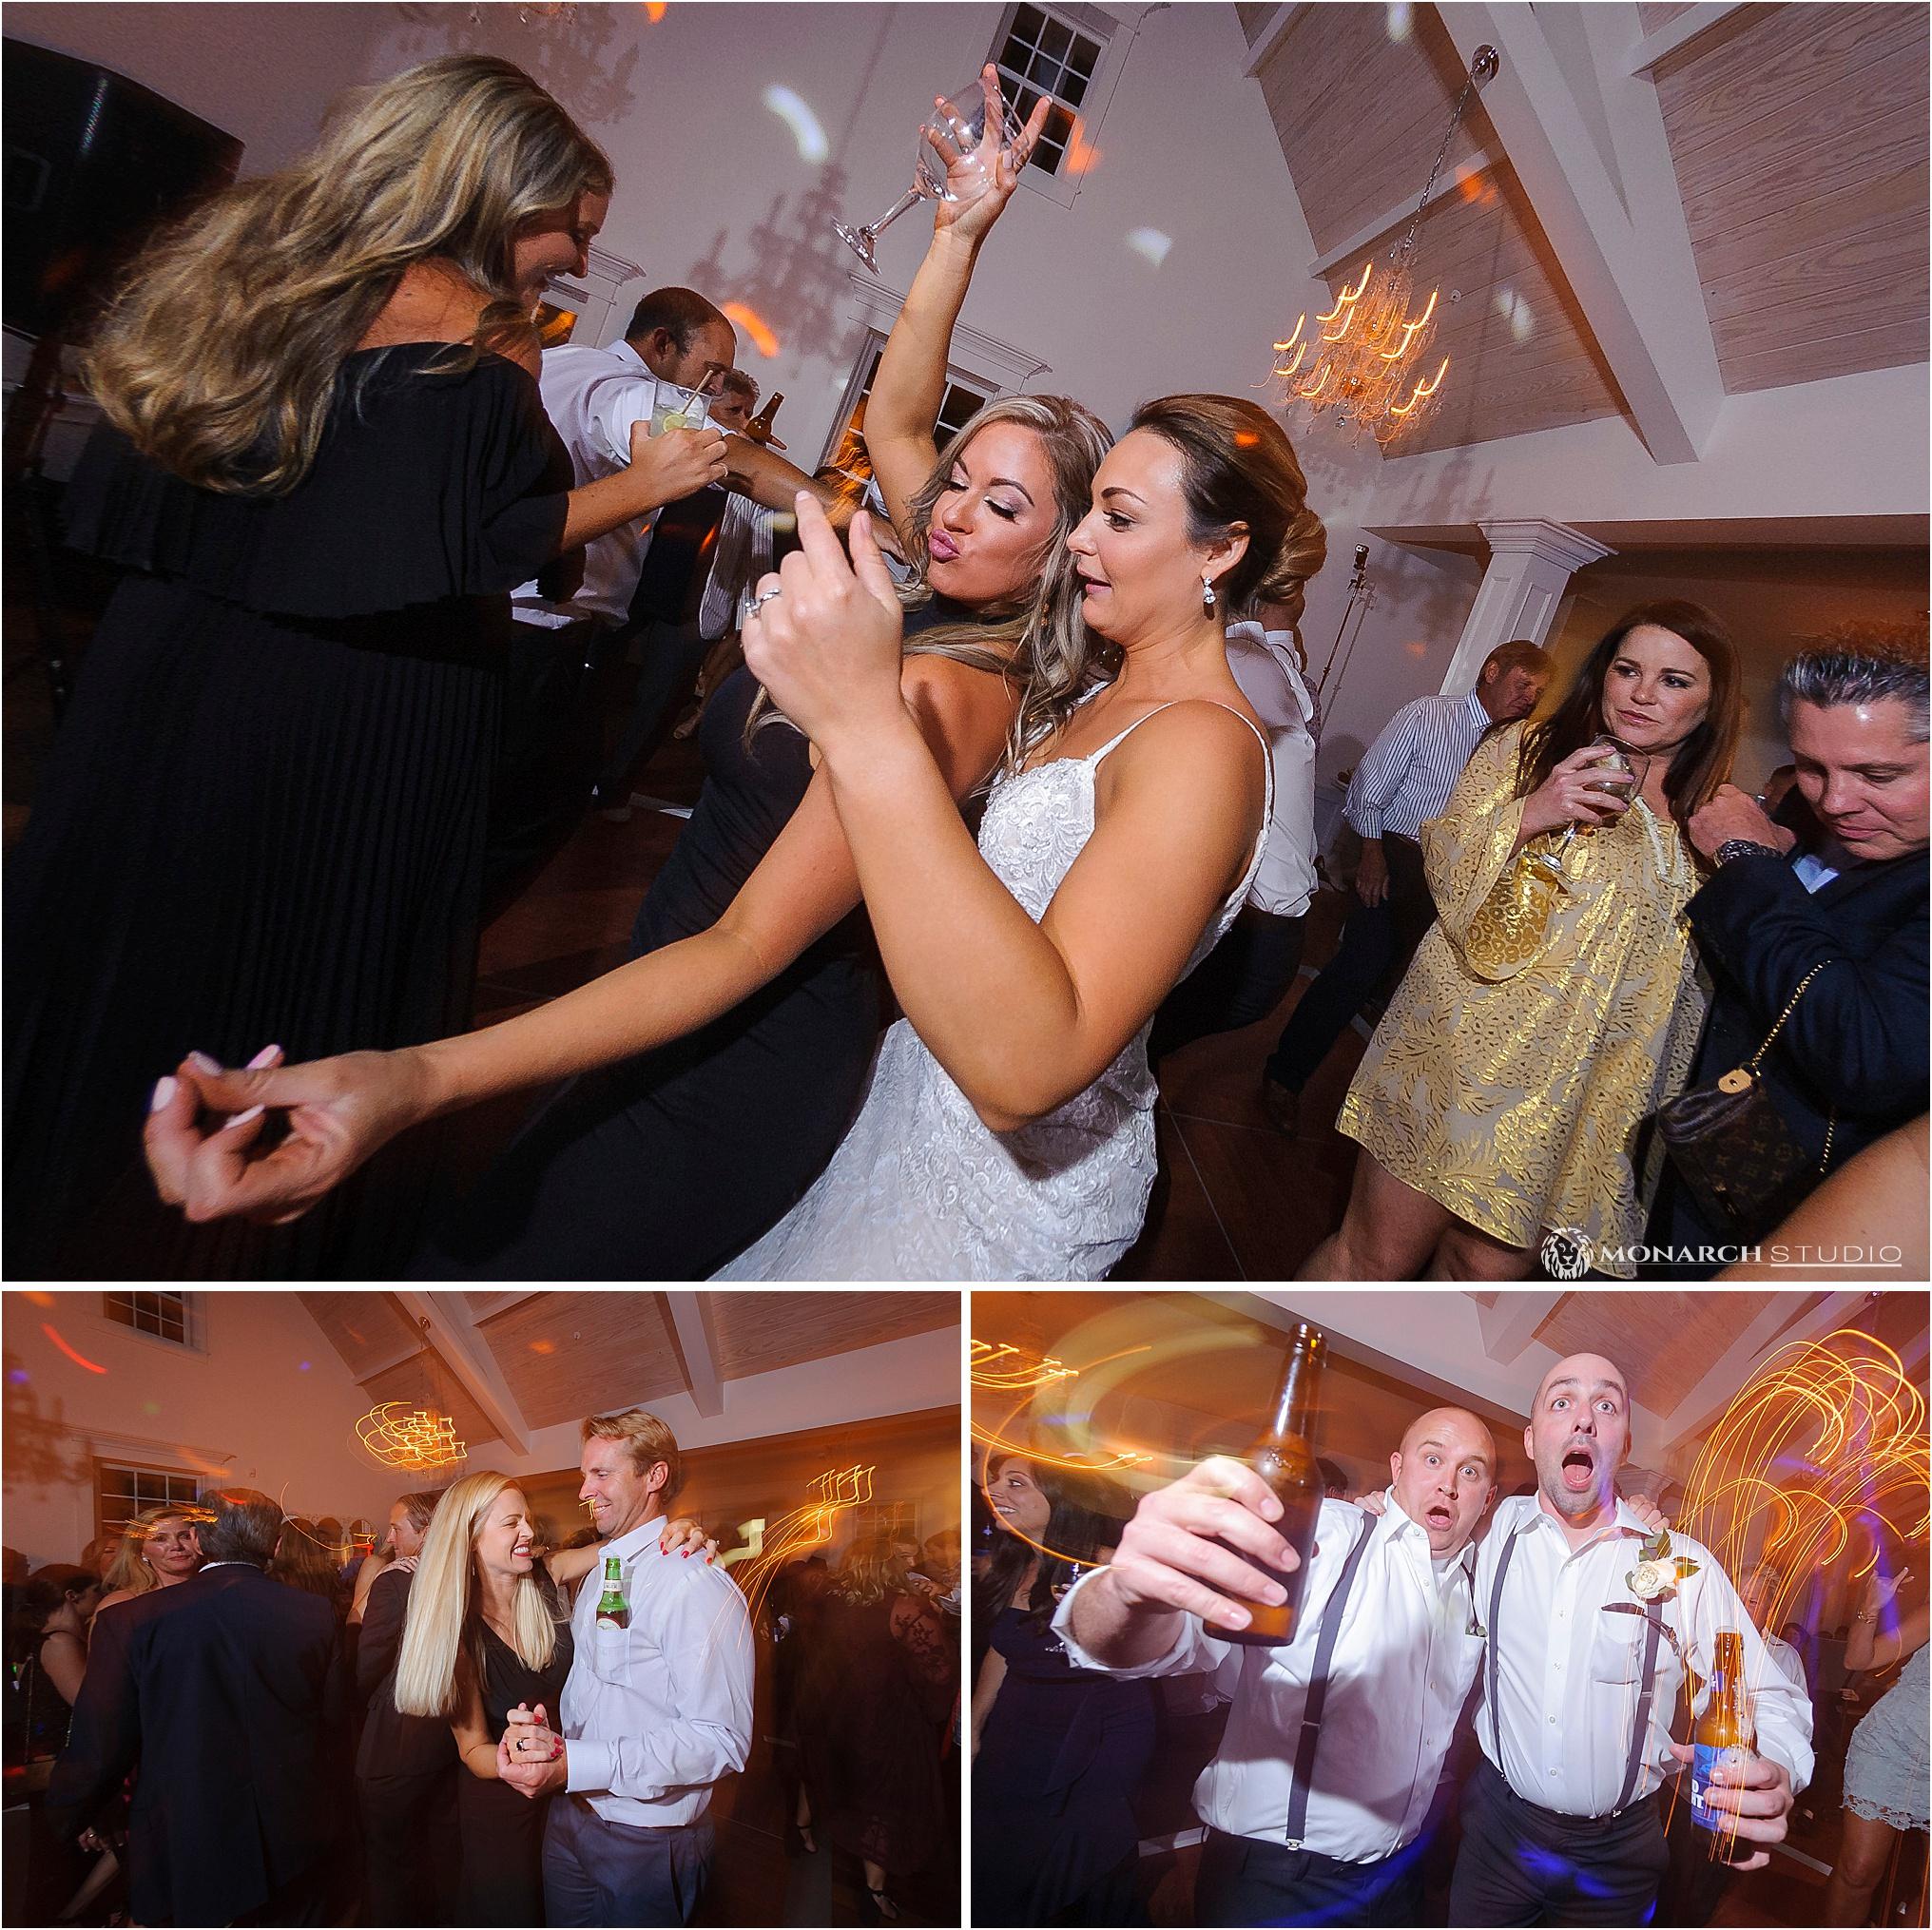 114-whiteroom-wedding-photographer-2019-05-22_0096.jpg